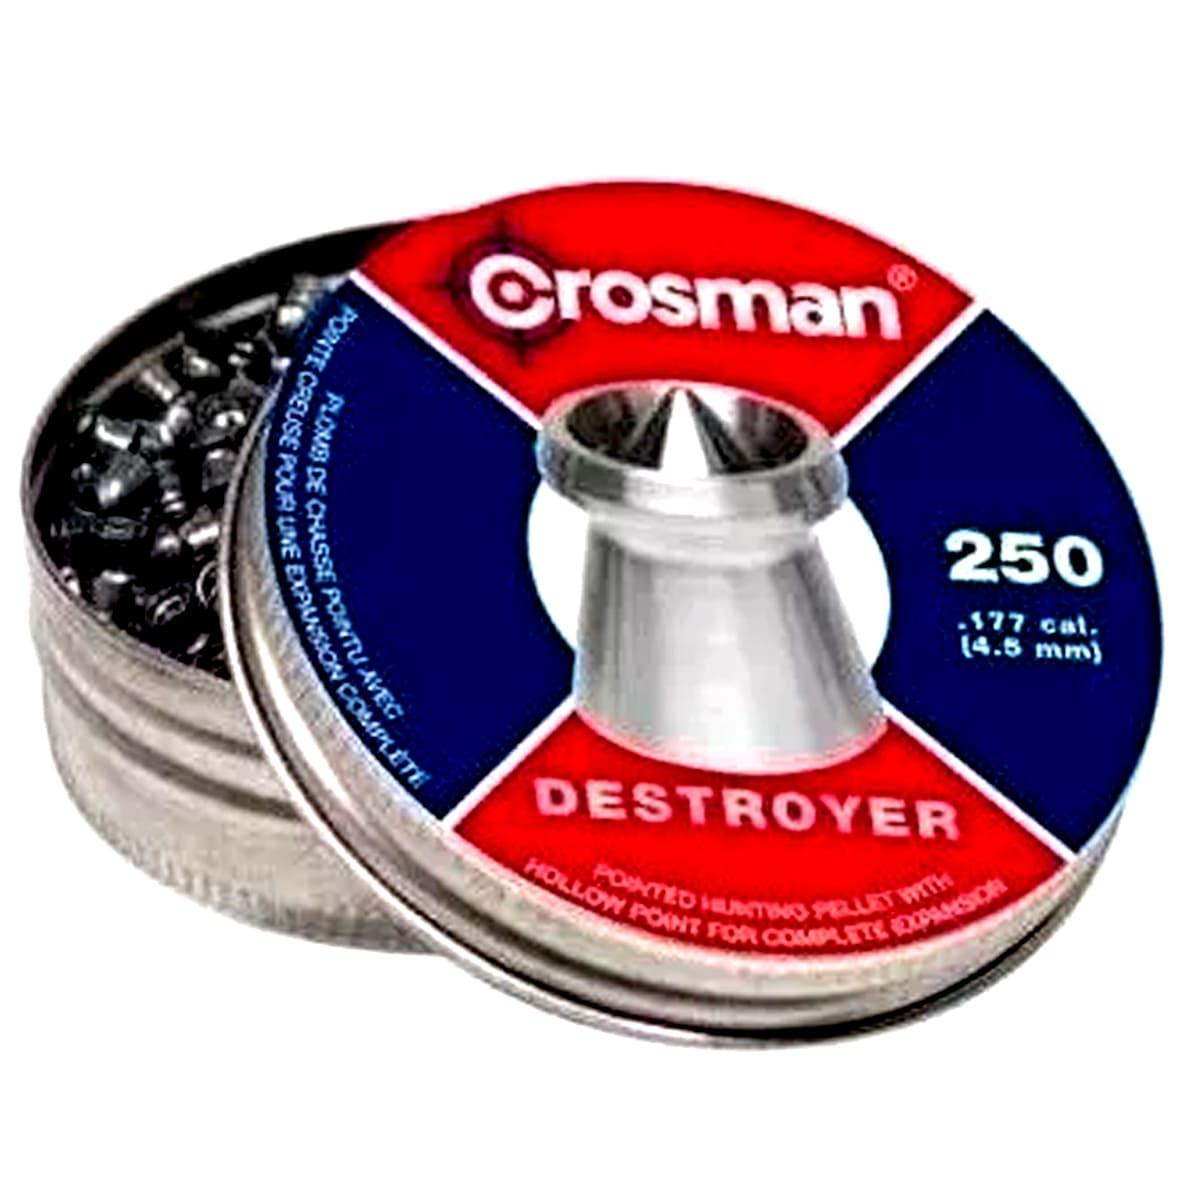 Chumbinho Premier Destroyer Ex Crosman Cal 4,5mm - 250 Un